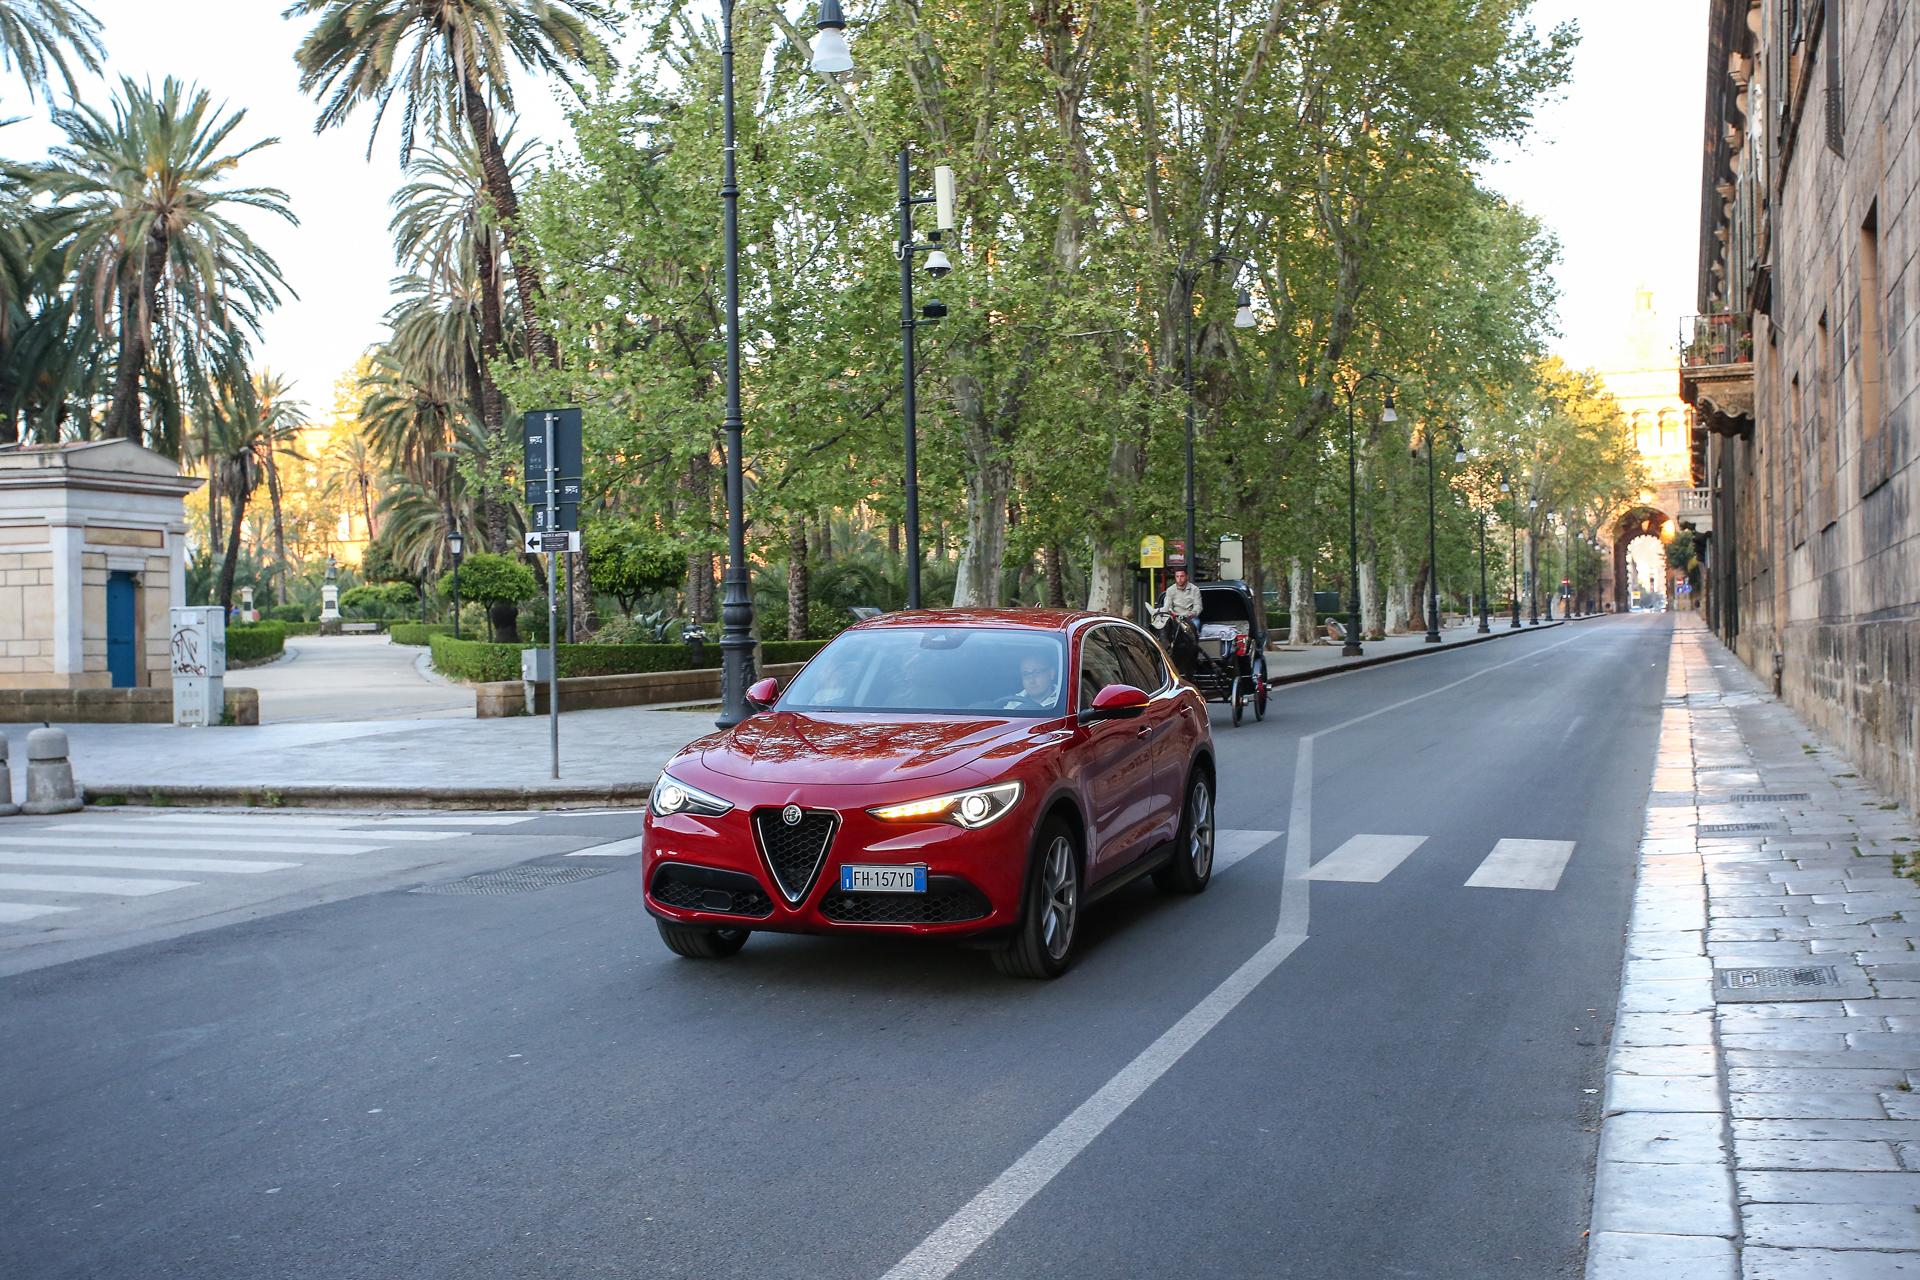 170420_Alfa-Romeo_Gastronomia_05-kopi.jpg